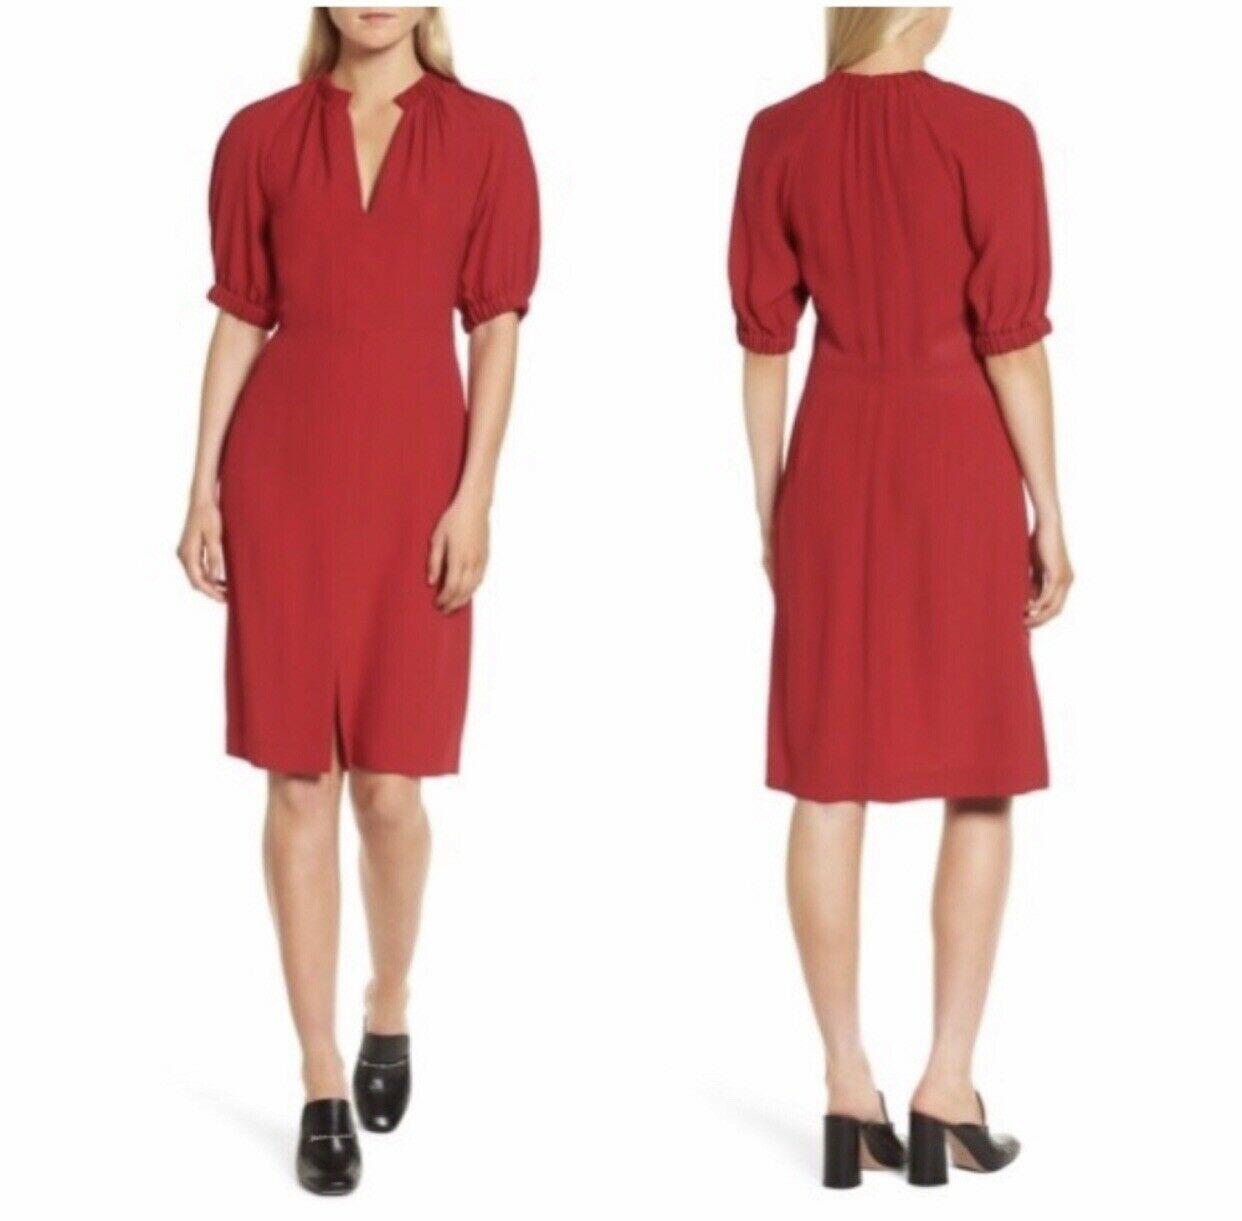 LEWIT Größe 6 Puff Sleeve Dress rot